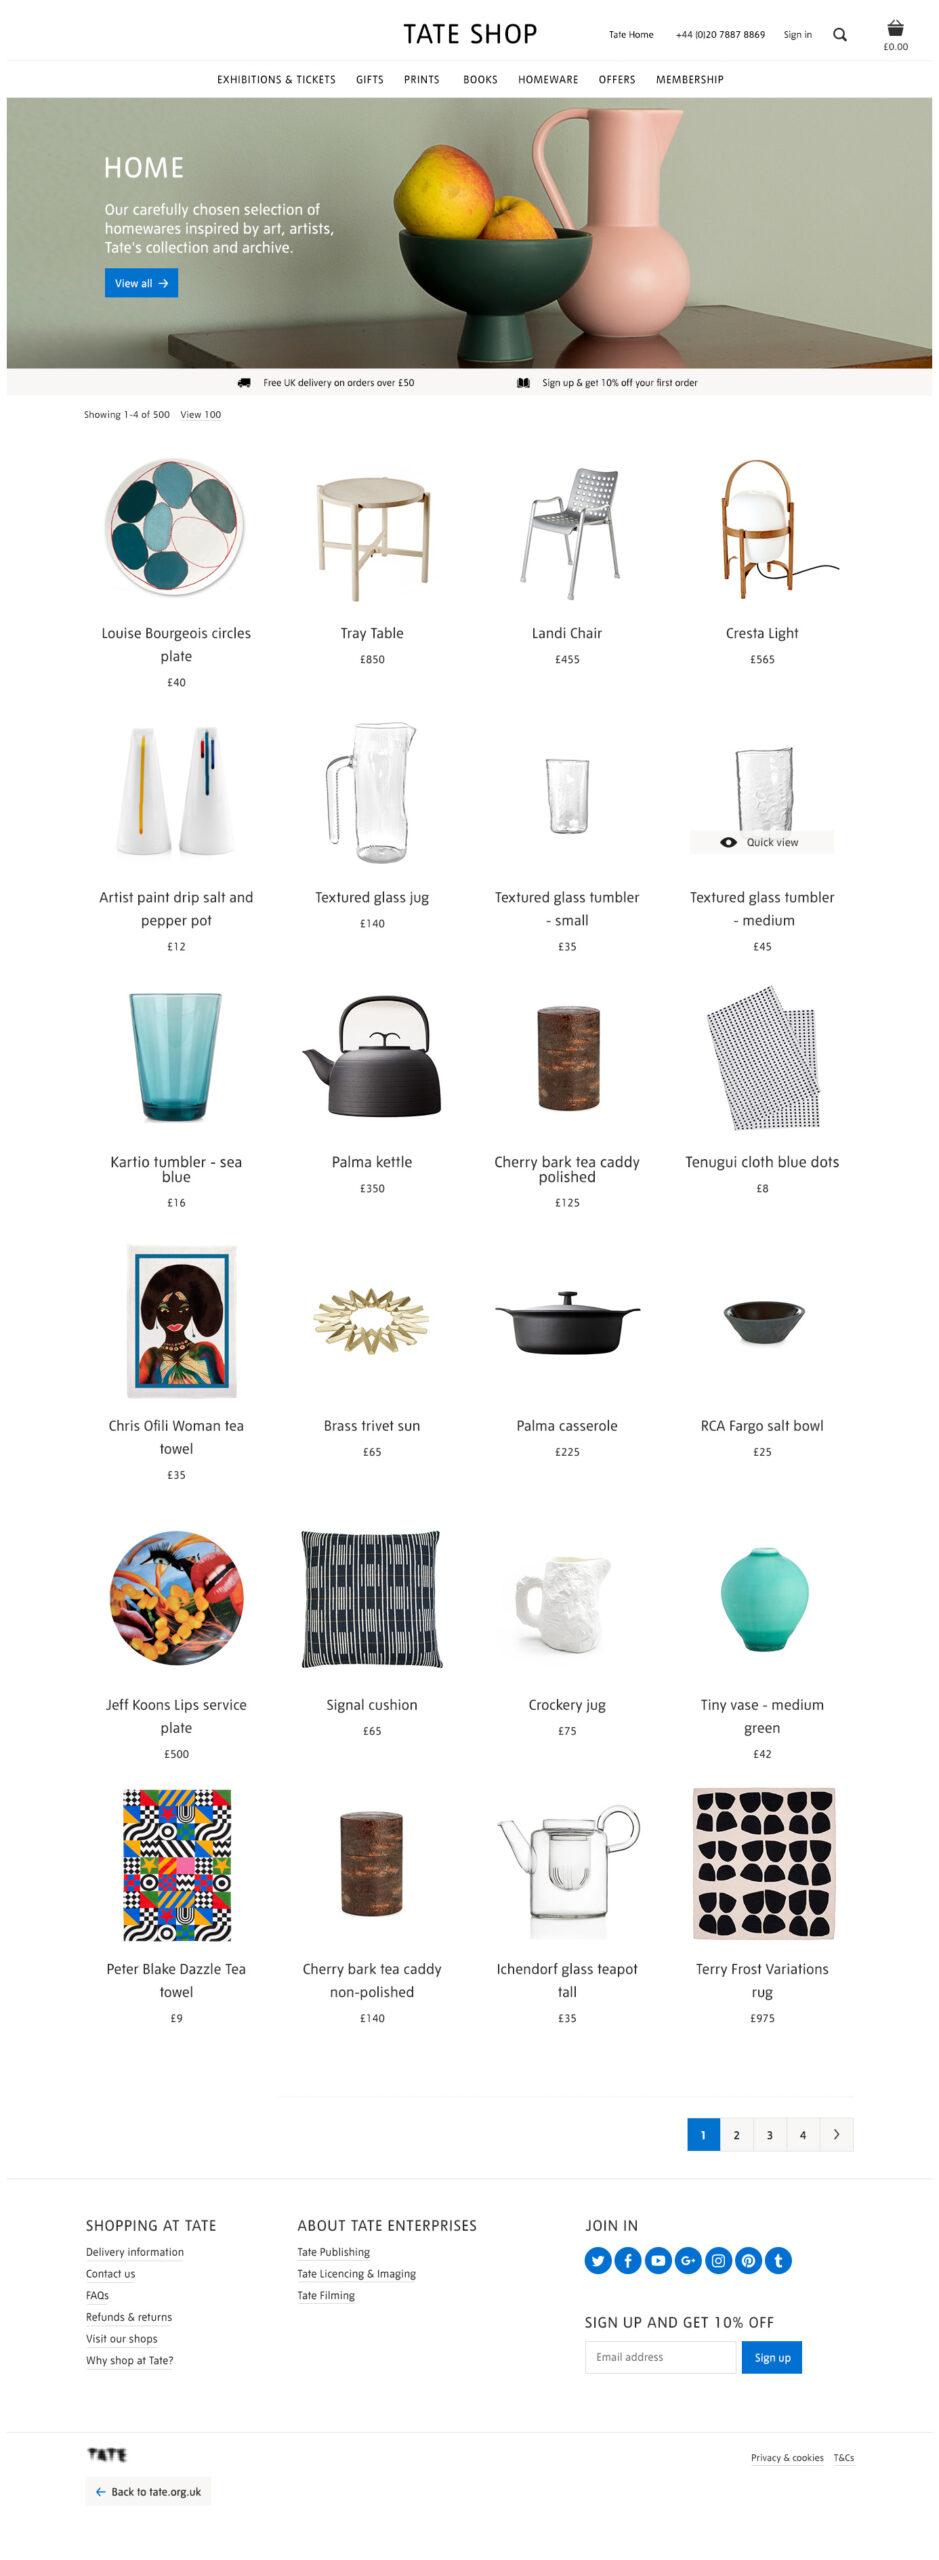 Tate-Shop-Homeware-PLP